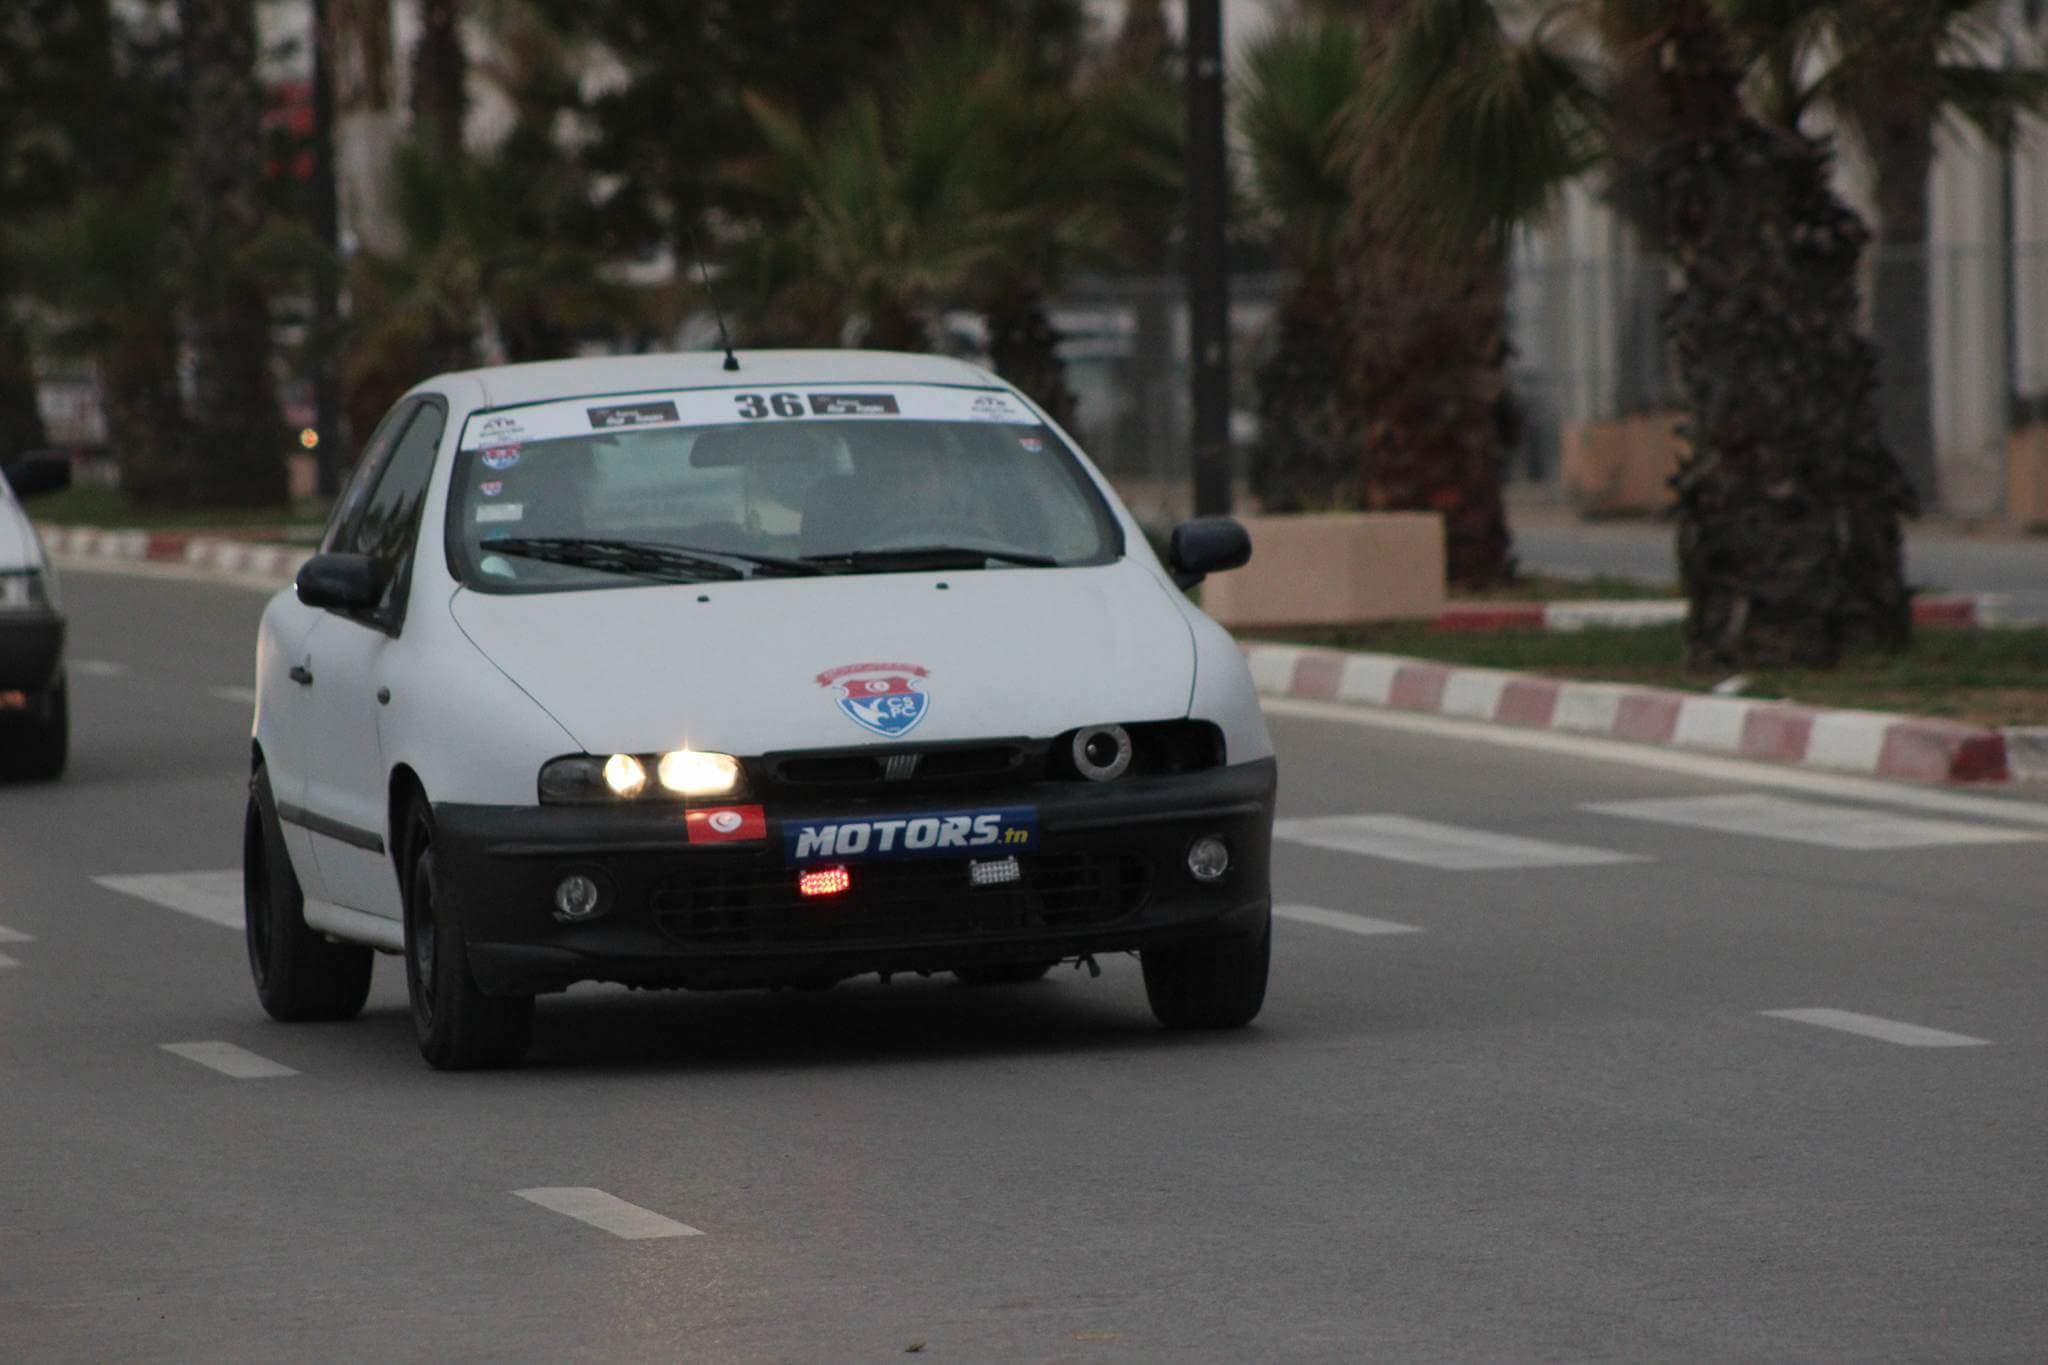 Swap Fiat bravo 2.0 16v turbo Receiv10